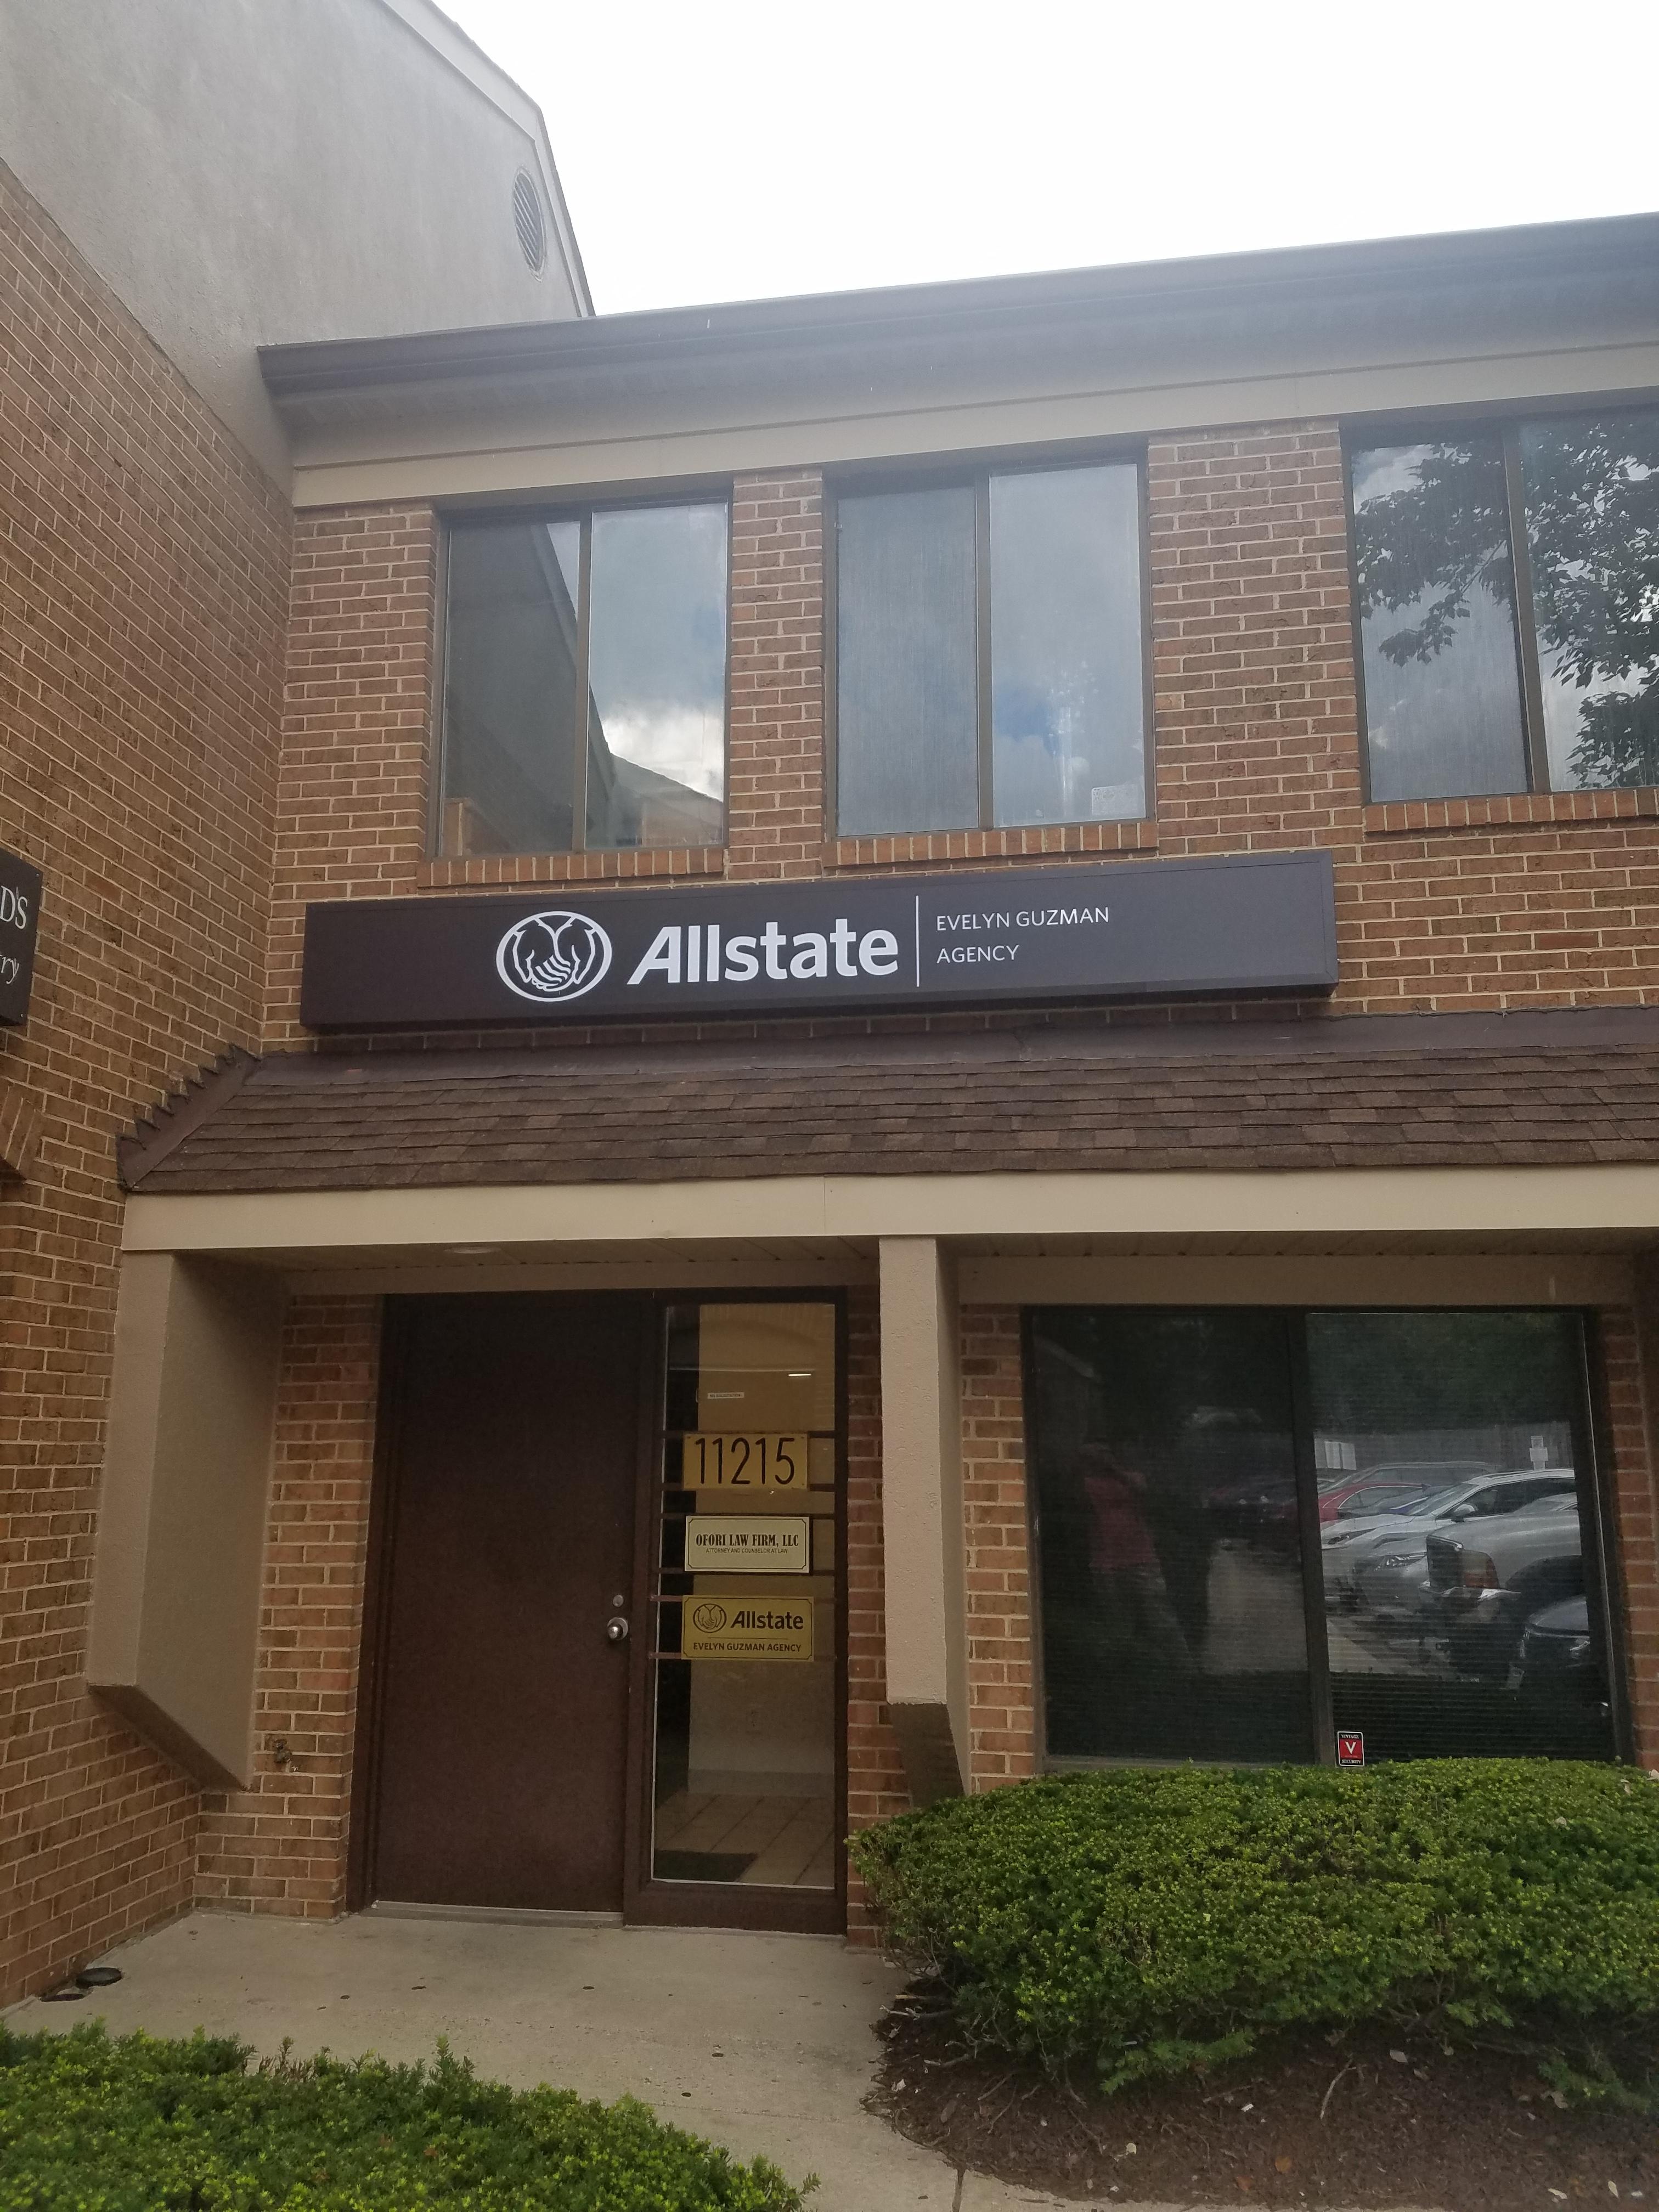 Evelyn Guzman: Allstate Insurance image 2